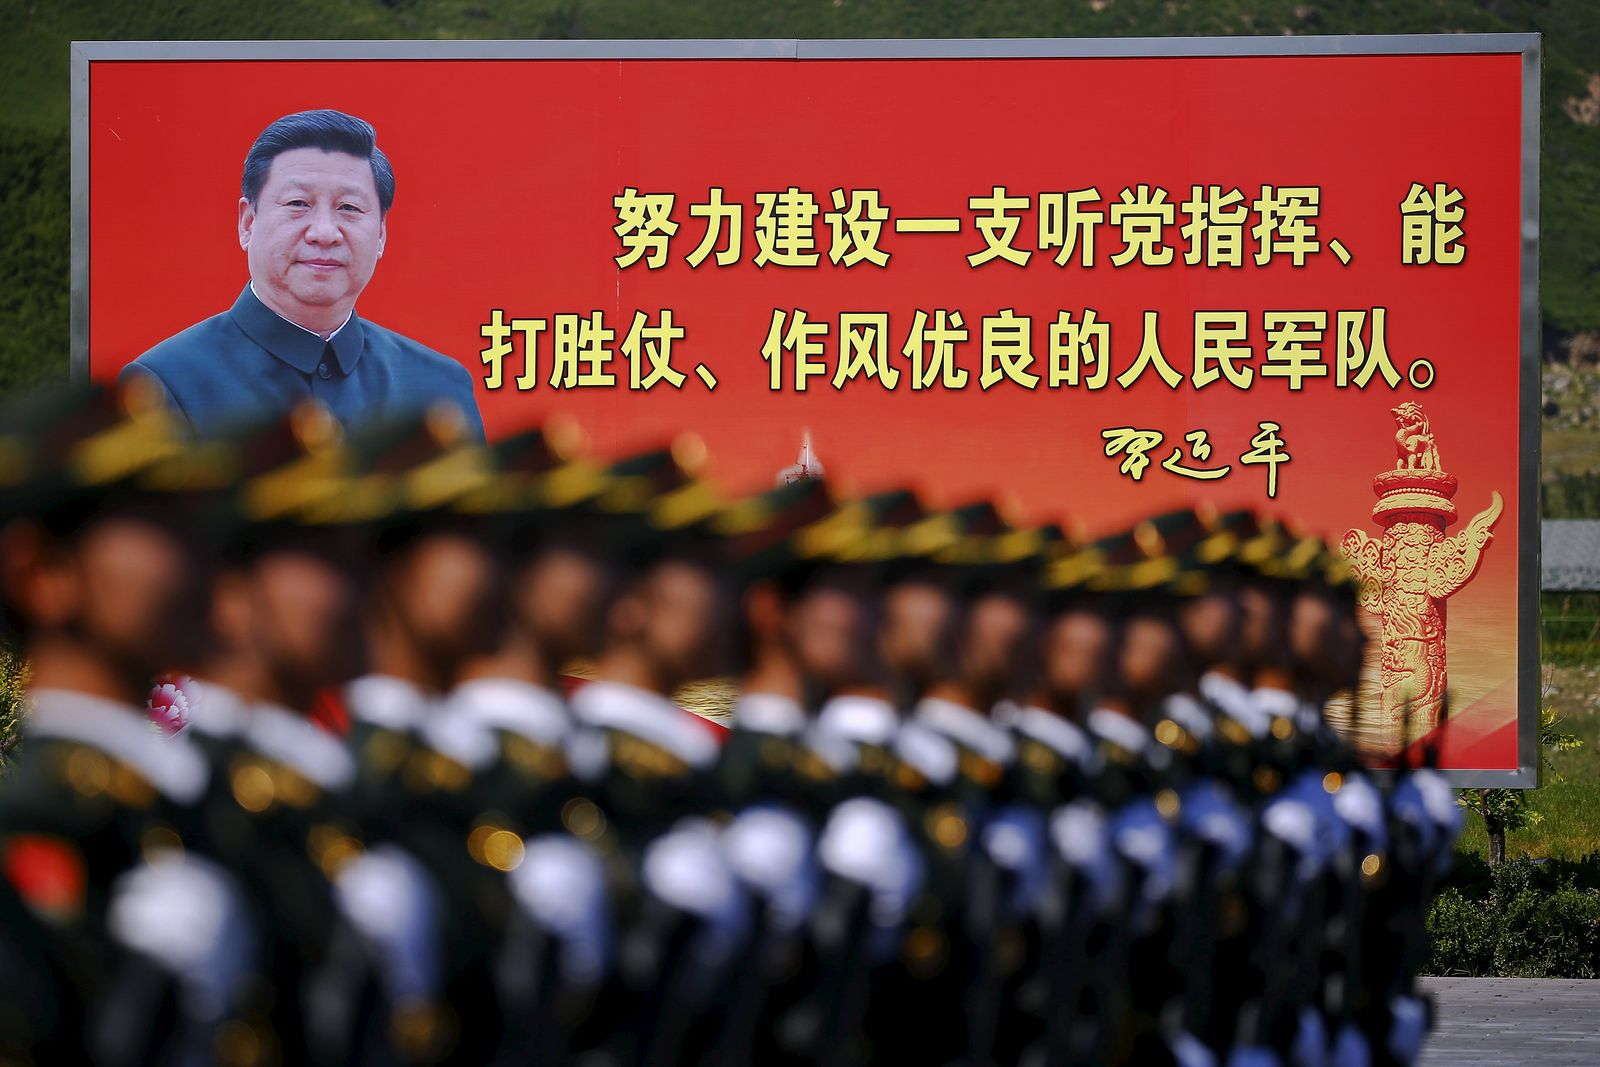 Xi Jinping/ Zweiter Weltkrieg/ Militärparade